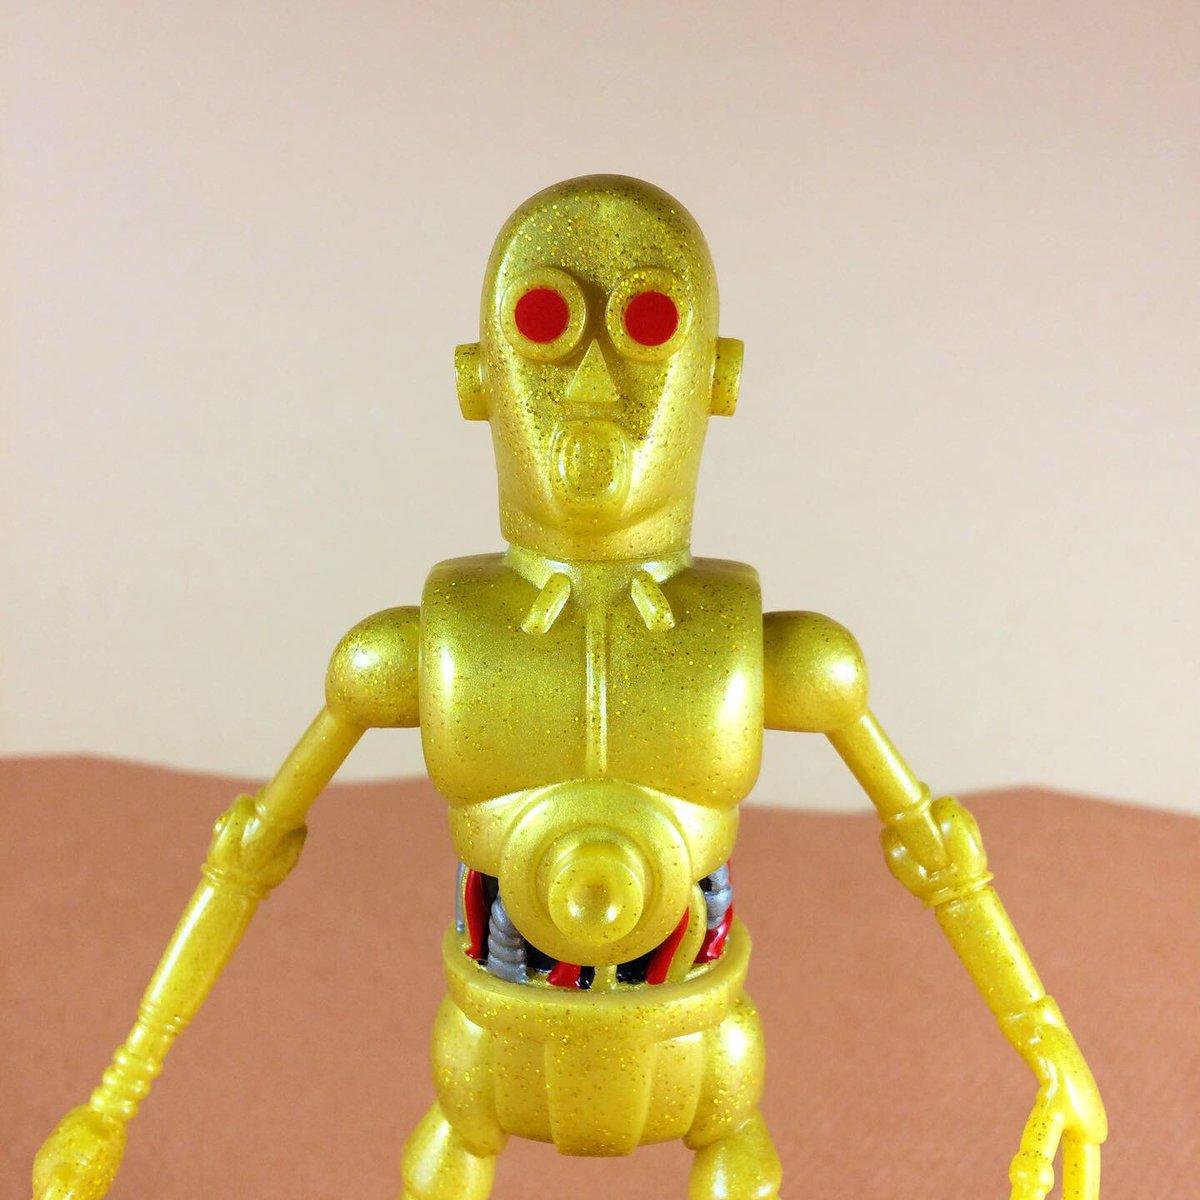 Image of C-3PO-LM9